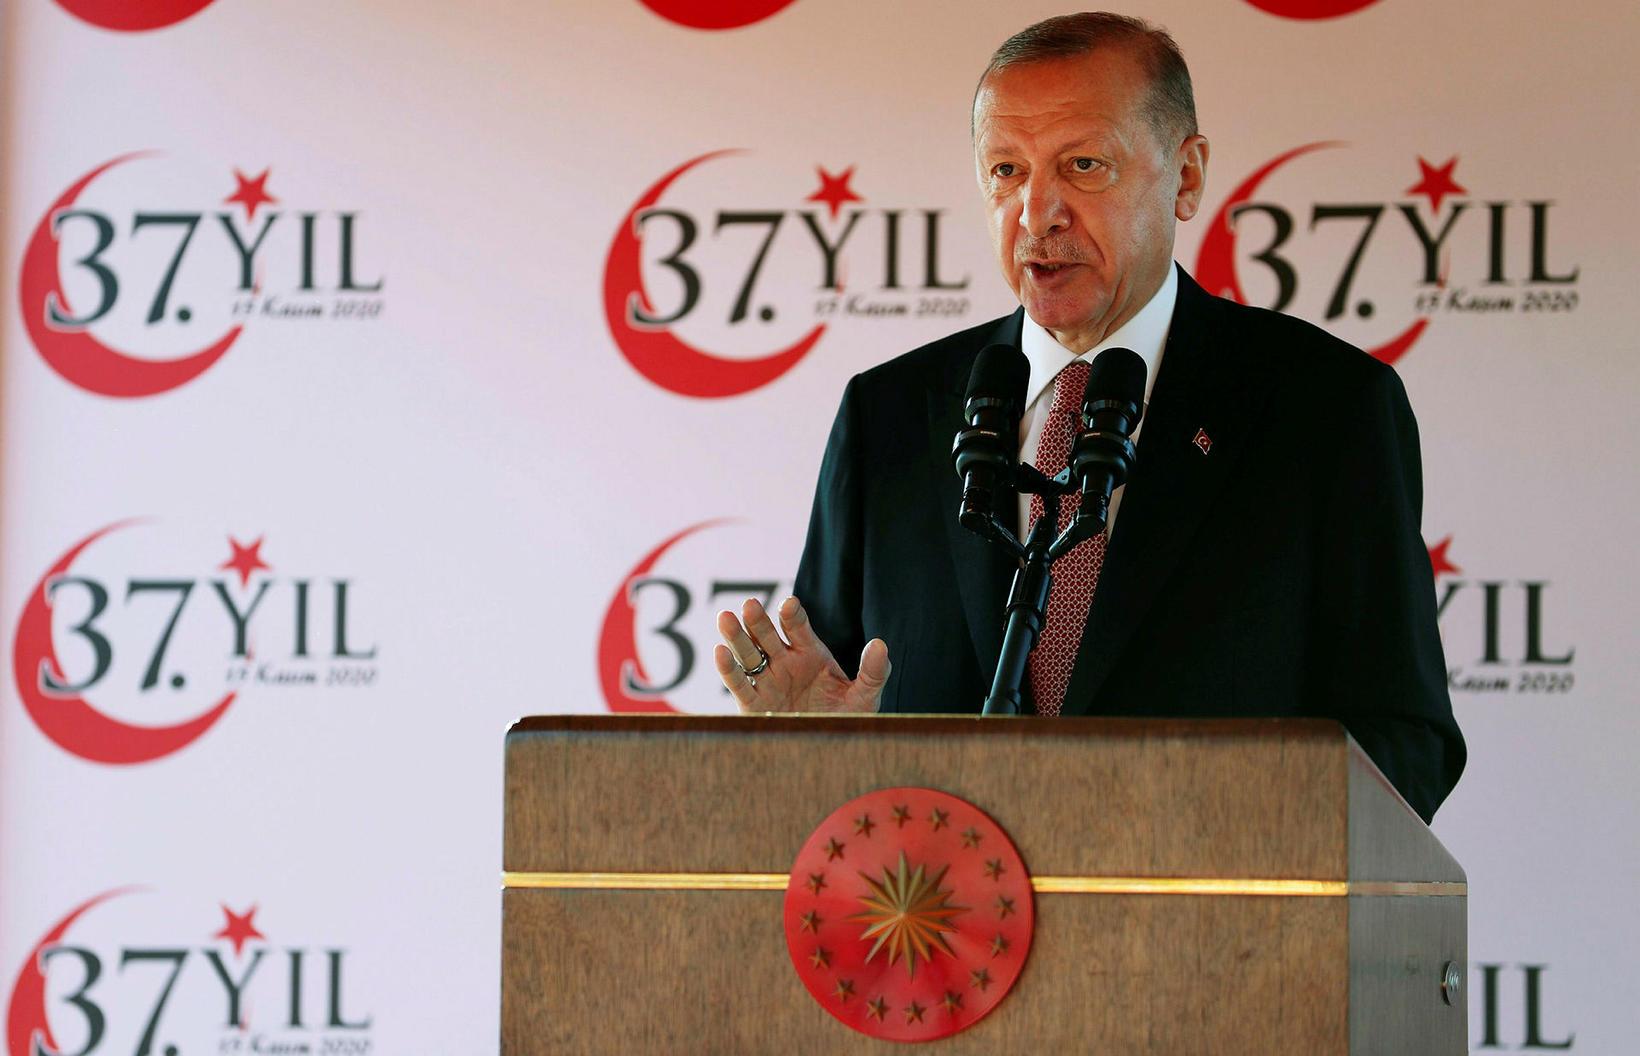 Erdogan, forseti Tyrklands.